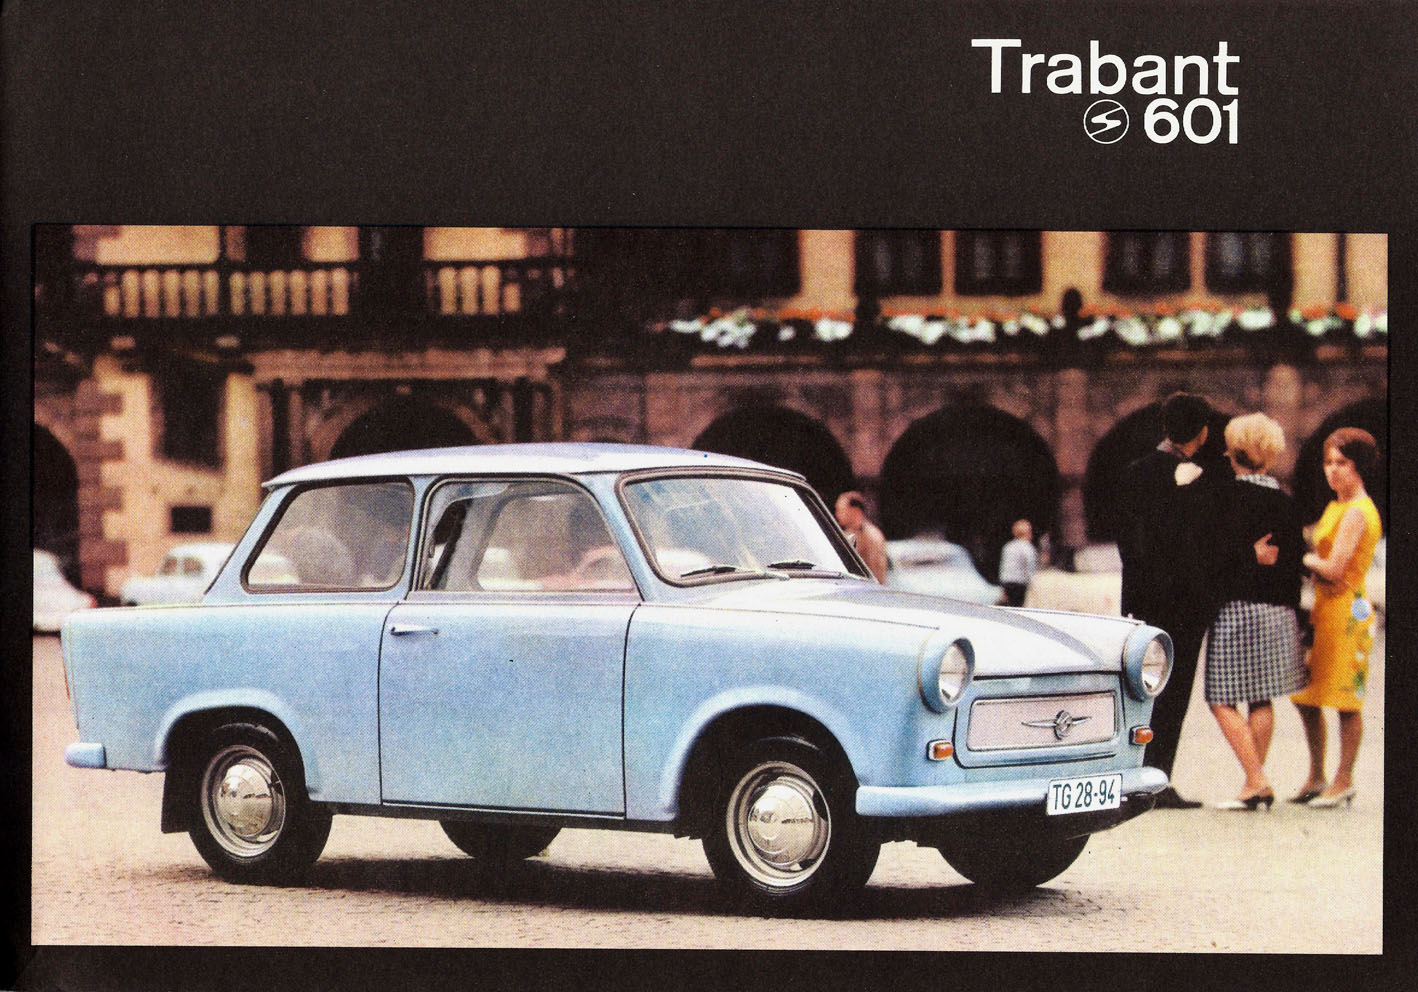 Turbo-Trabant: Alt kan restomoddes!